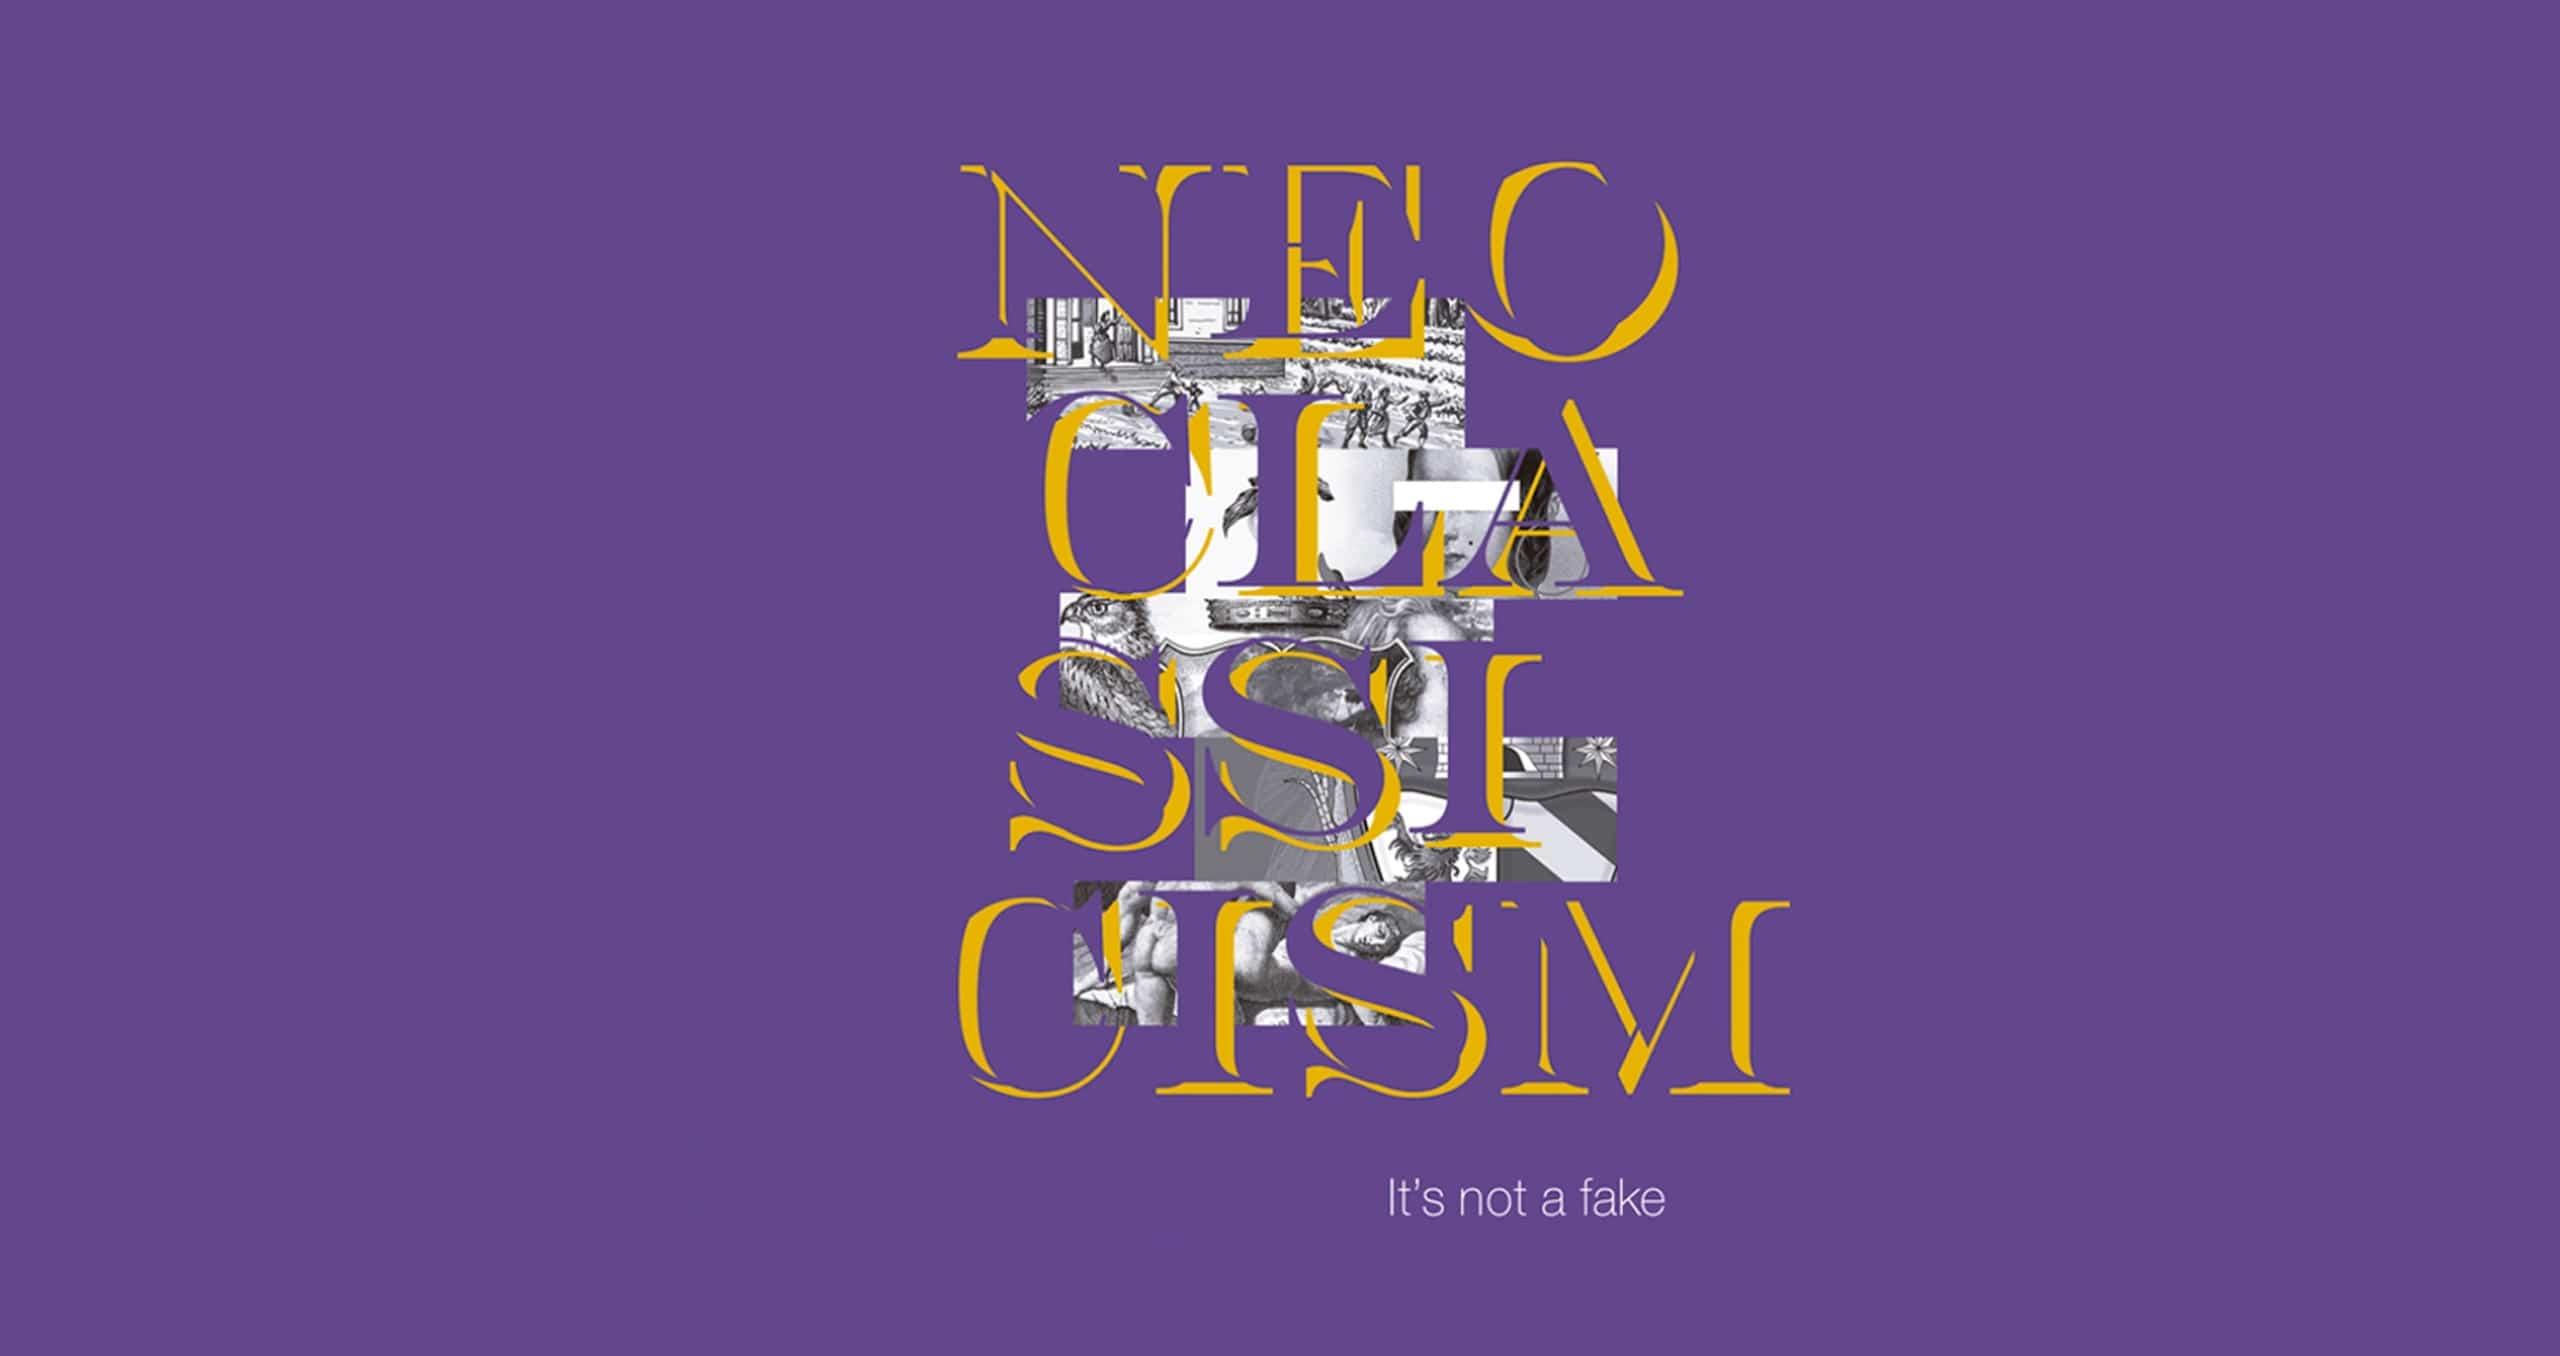 Avery Dennison neoclassicism